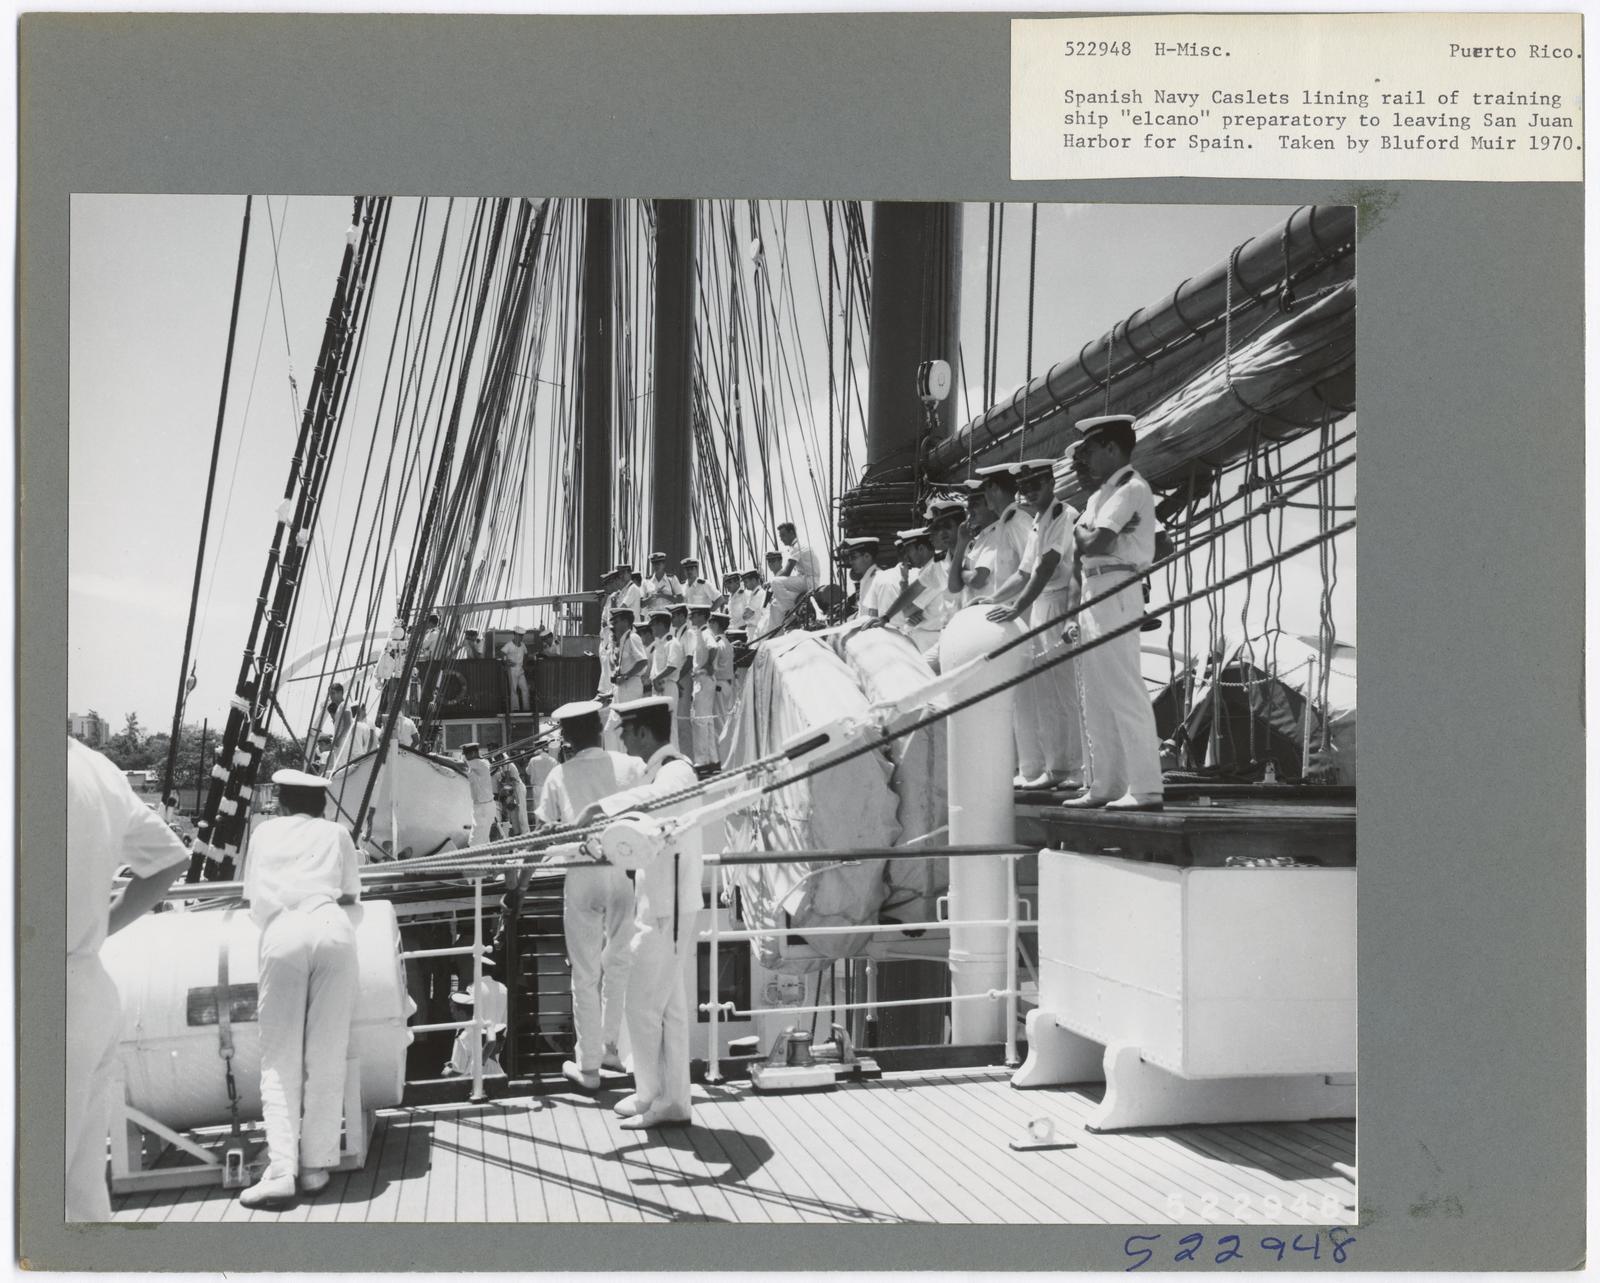 Historical Transportation - Puerto Rico